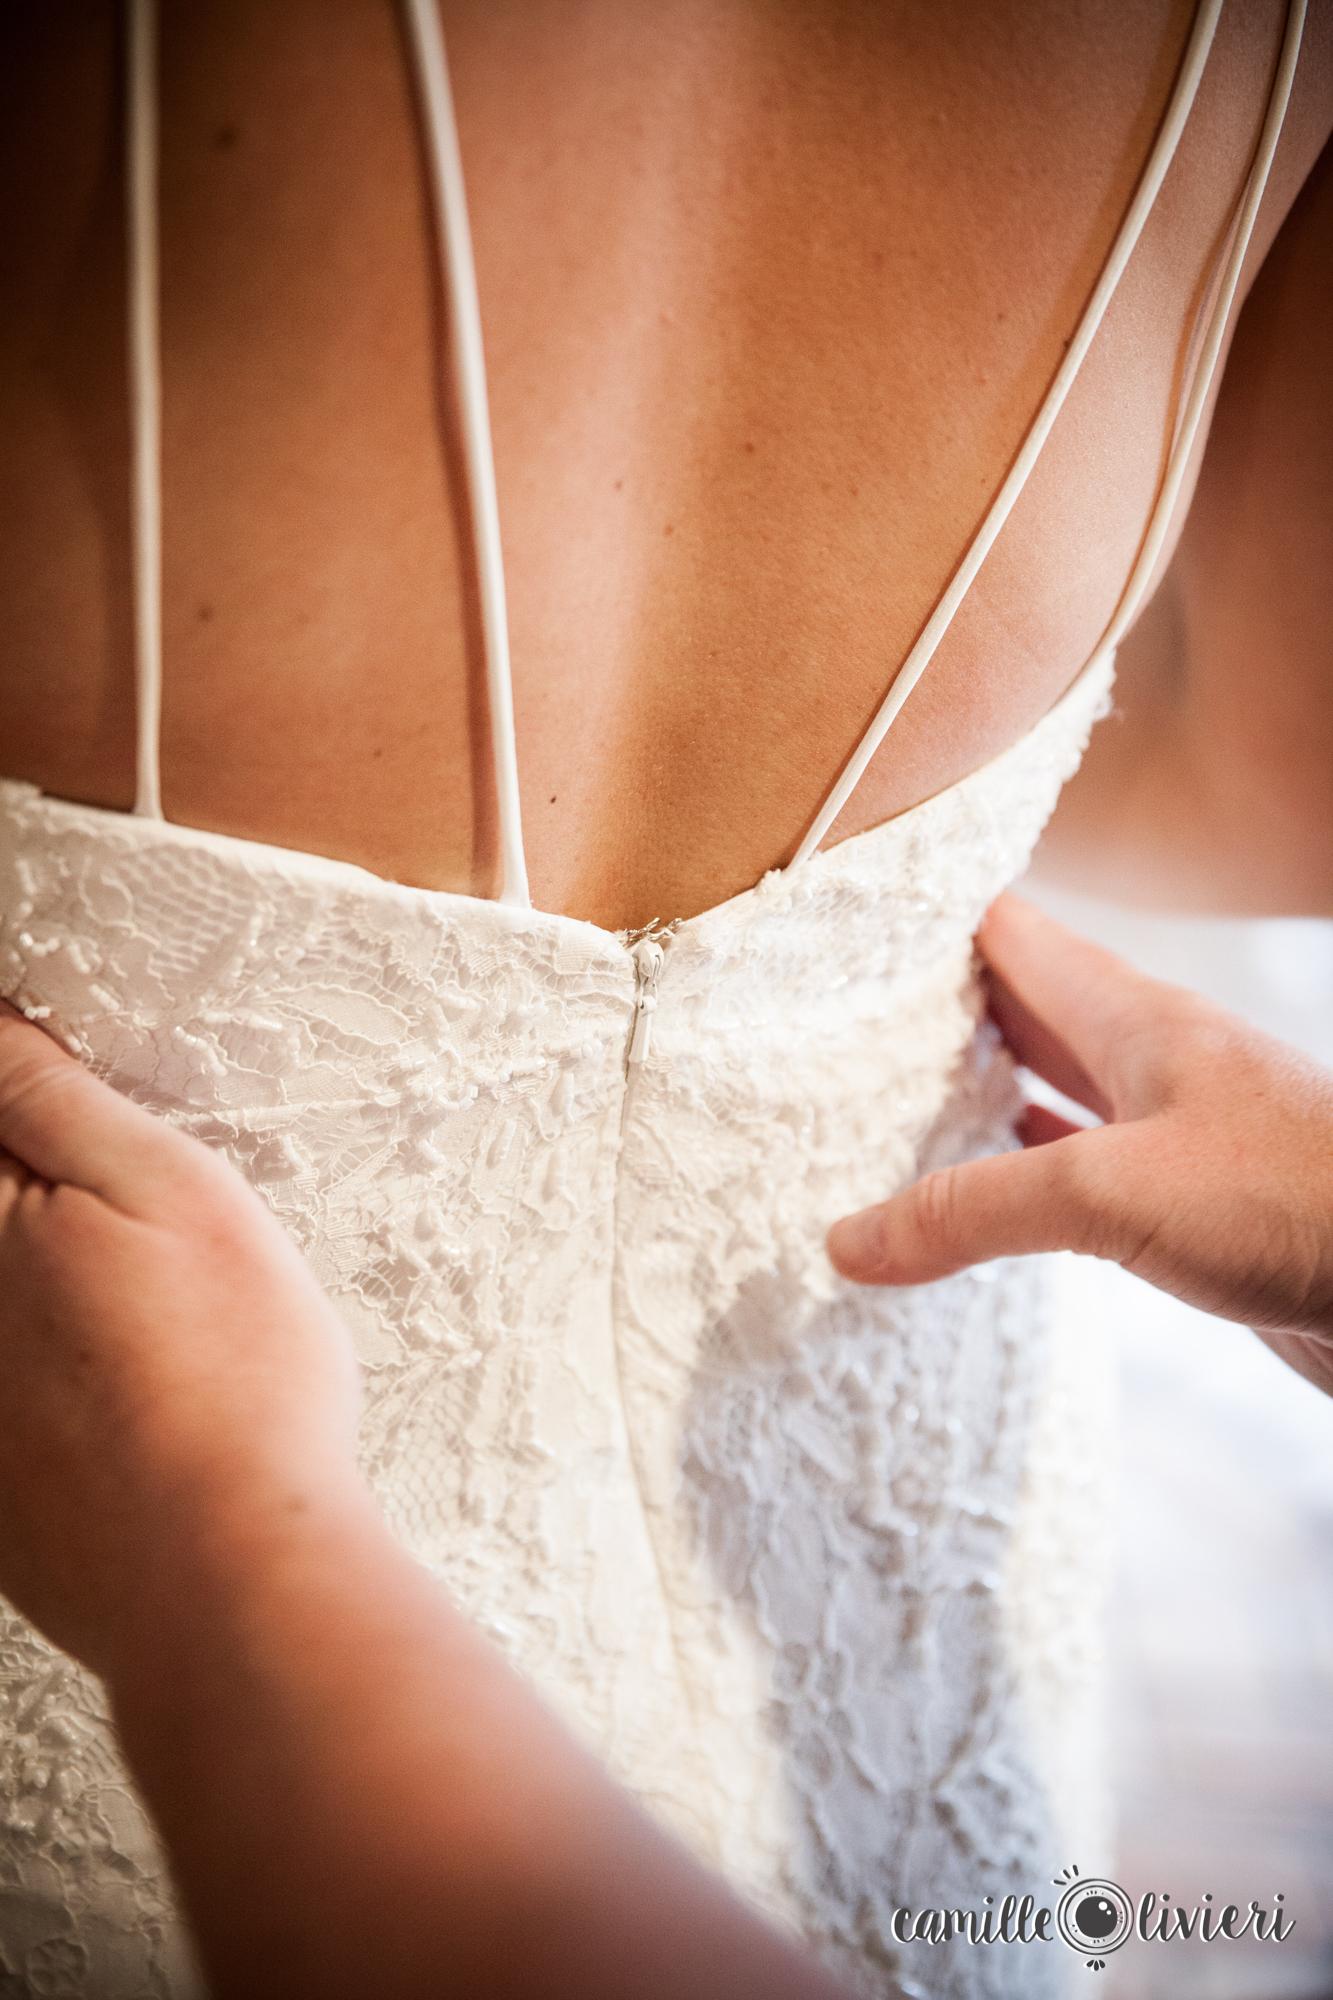 photographe_grenoble_mariage-camille-olivieri-18